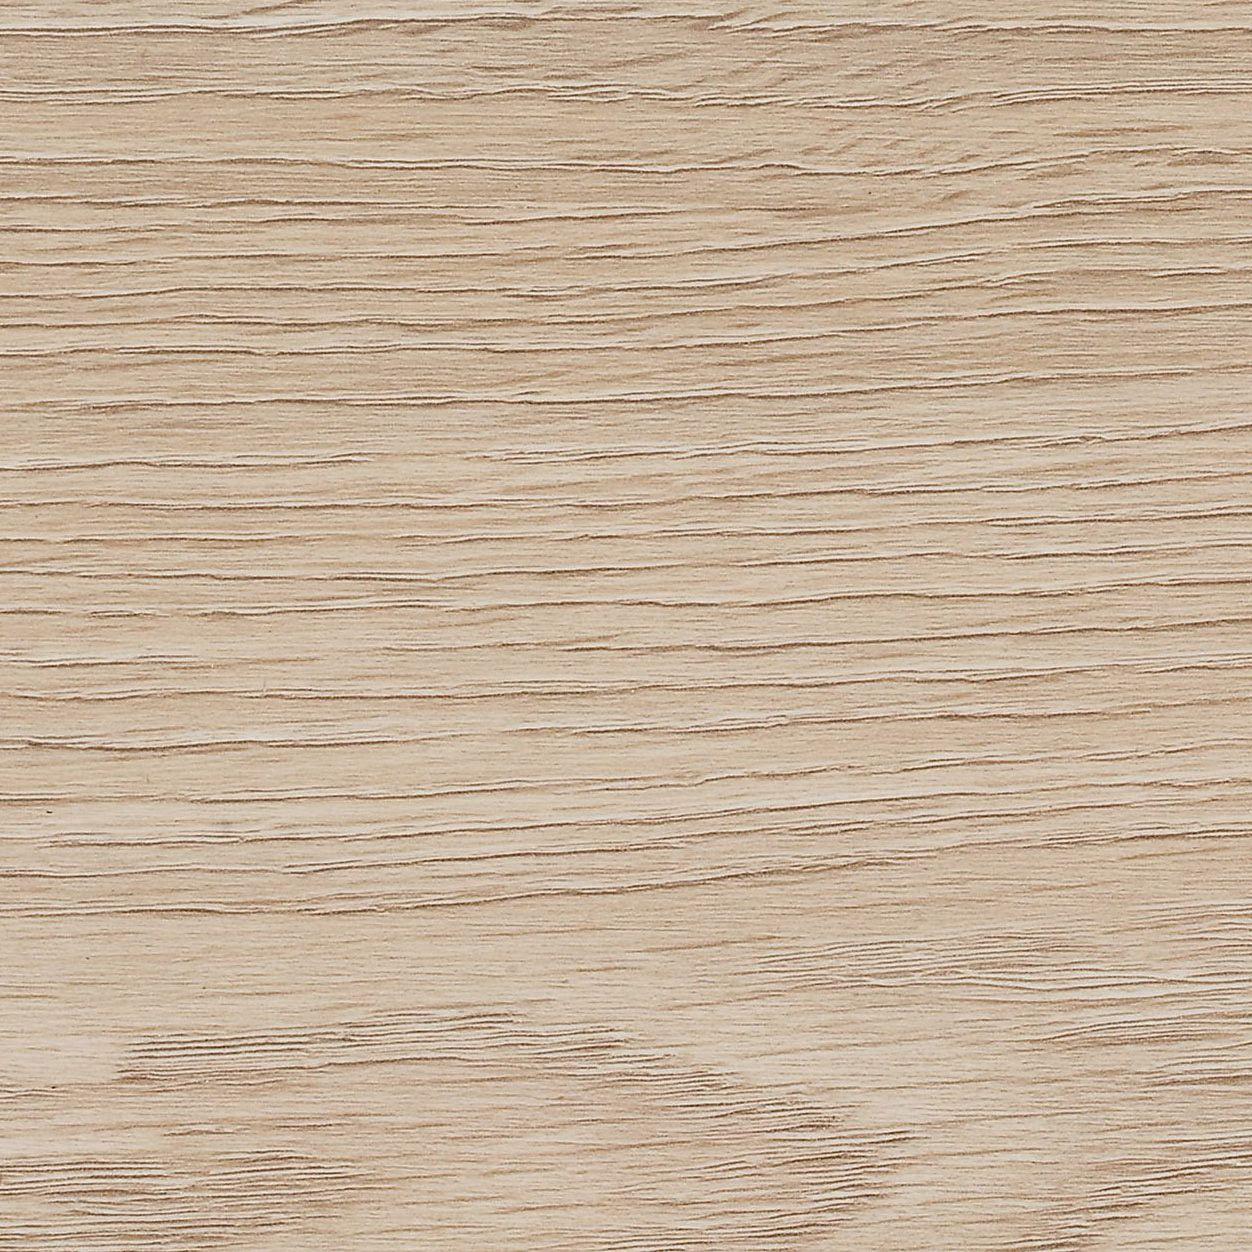 Toccata Natural Cardiff Oak Effect Laminate Flooring 1 65 M² Sample Departments Diy At B Q